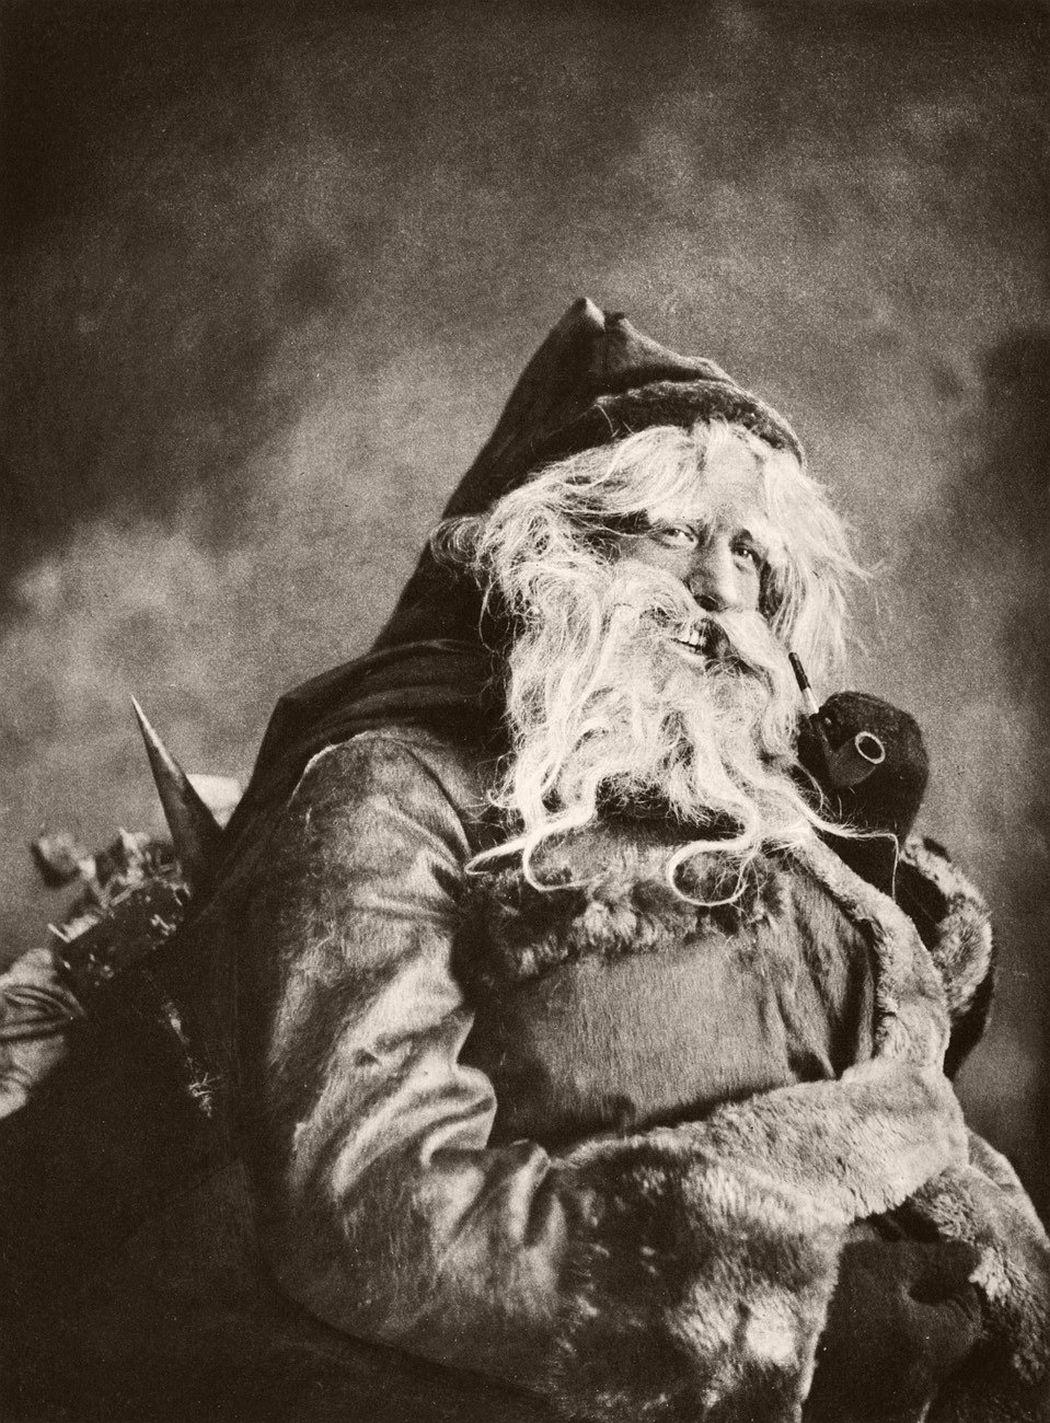 Vintage Santa Claus In The Past MONOVISIONS